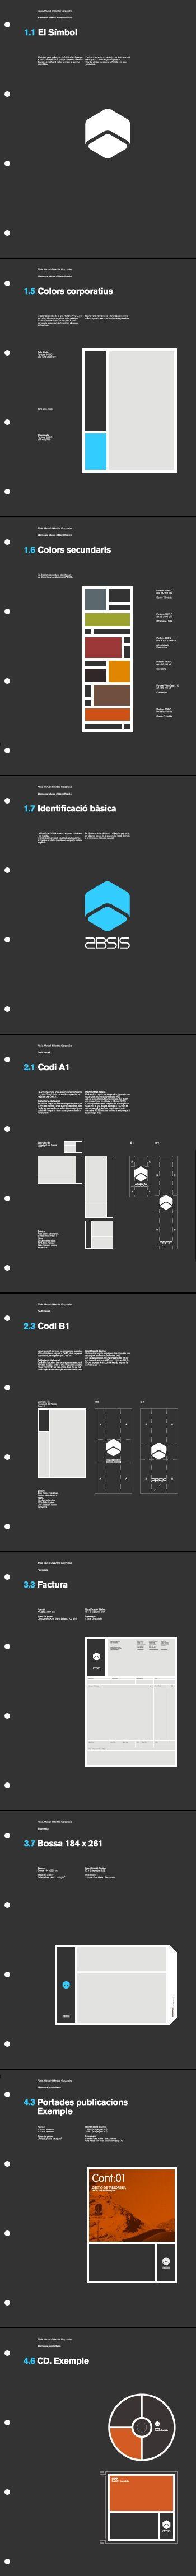 grid/layout